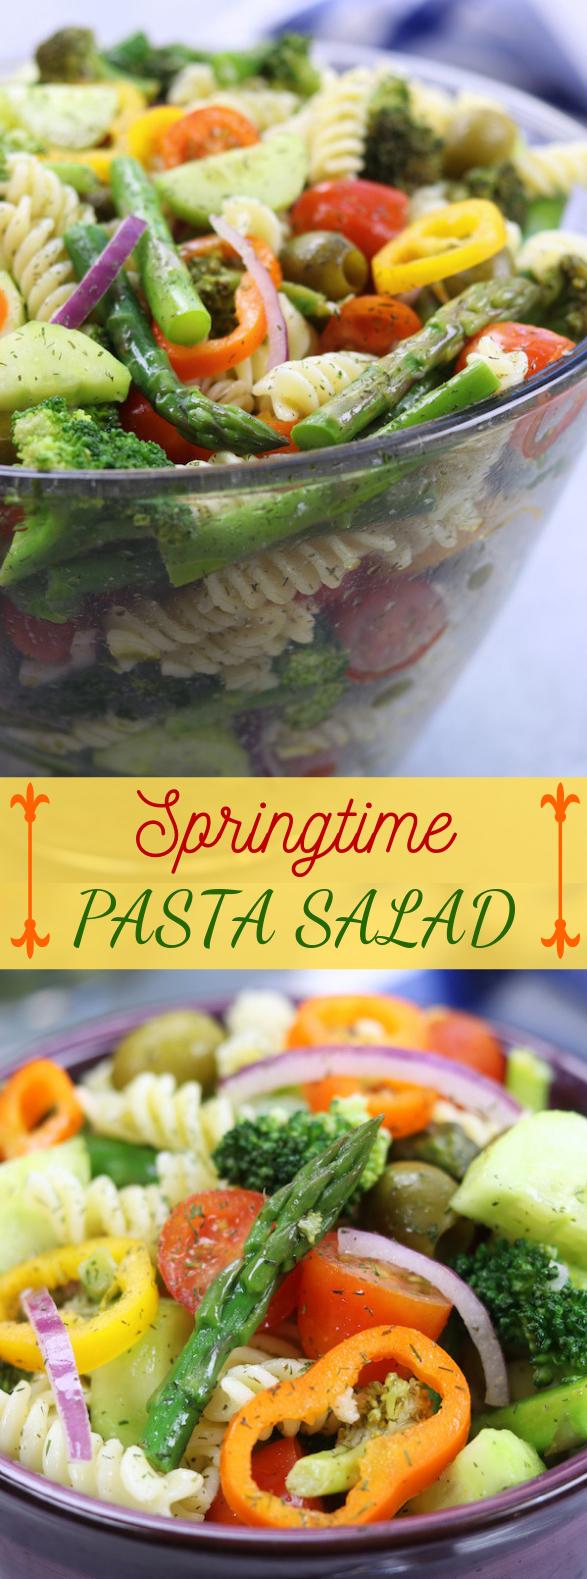 Springtime Pasta Salad #veggies #saladrecipes images